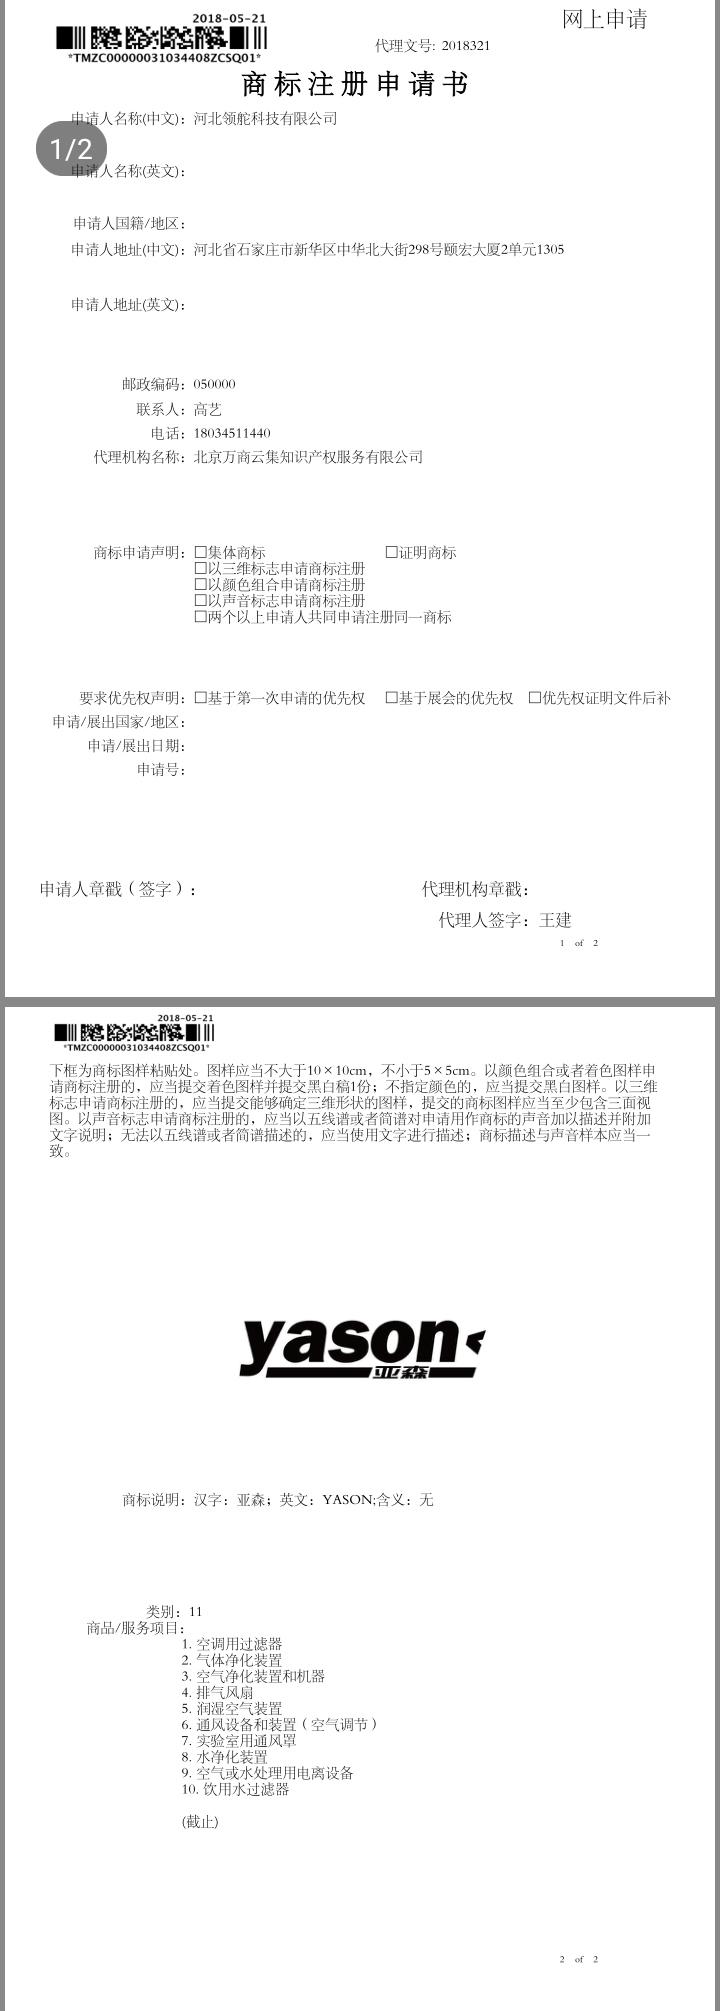 亚森(YASON)